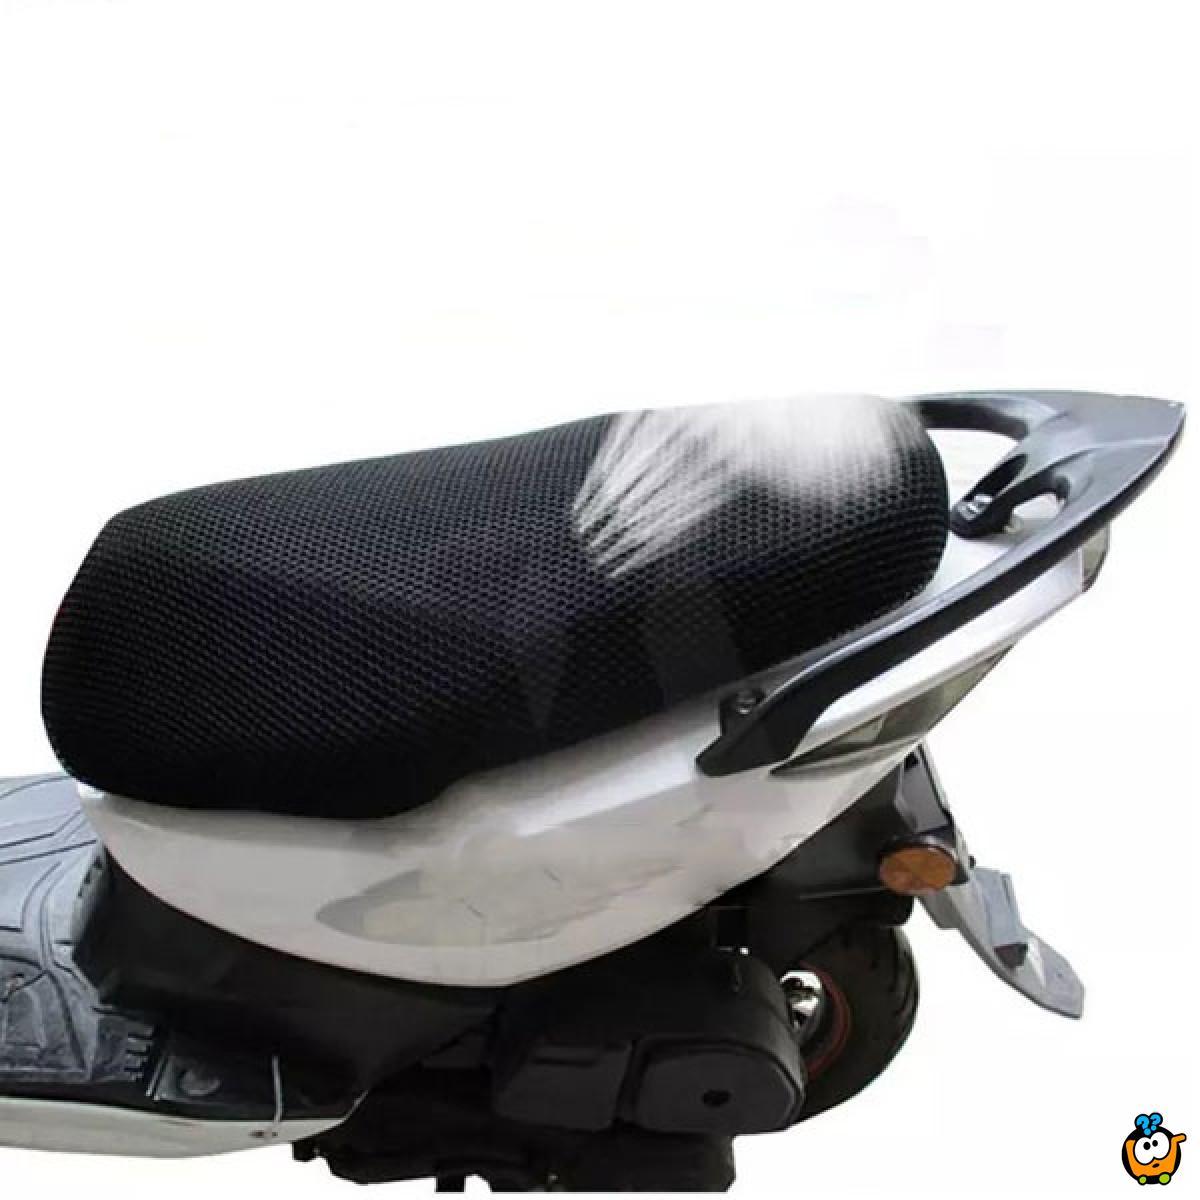 Moto Cover – Prozračna navlaka za sedište motora